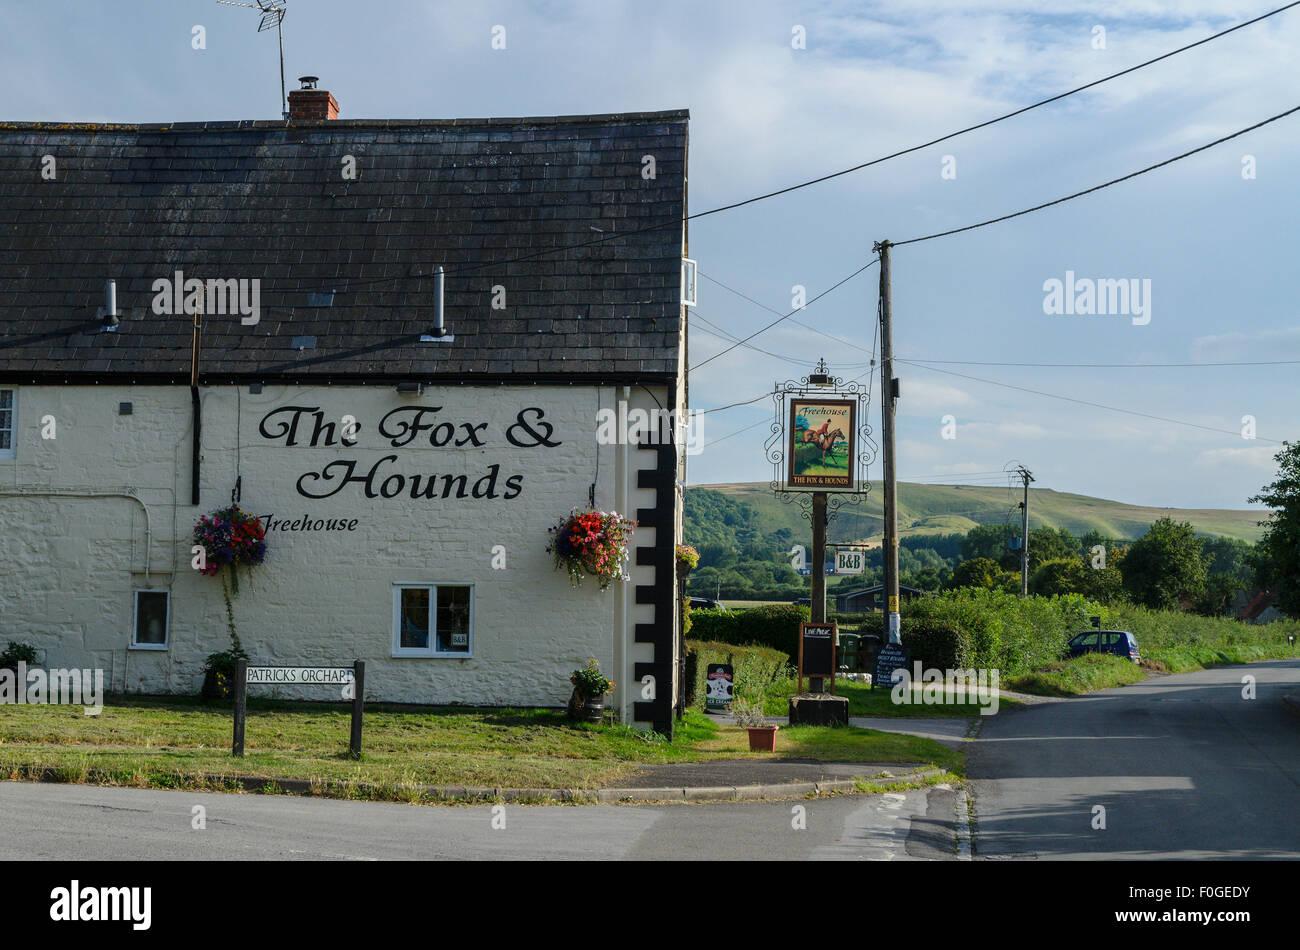 The Fox and Hounds Pub, Uffington, Oxfordshire, England, UK Stock Photo